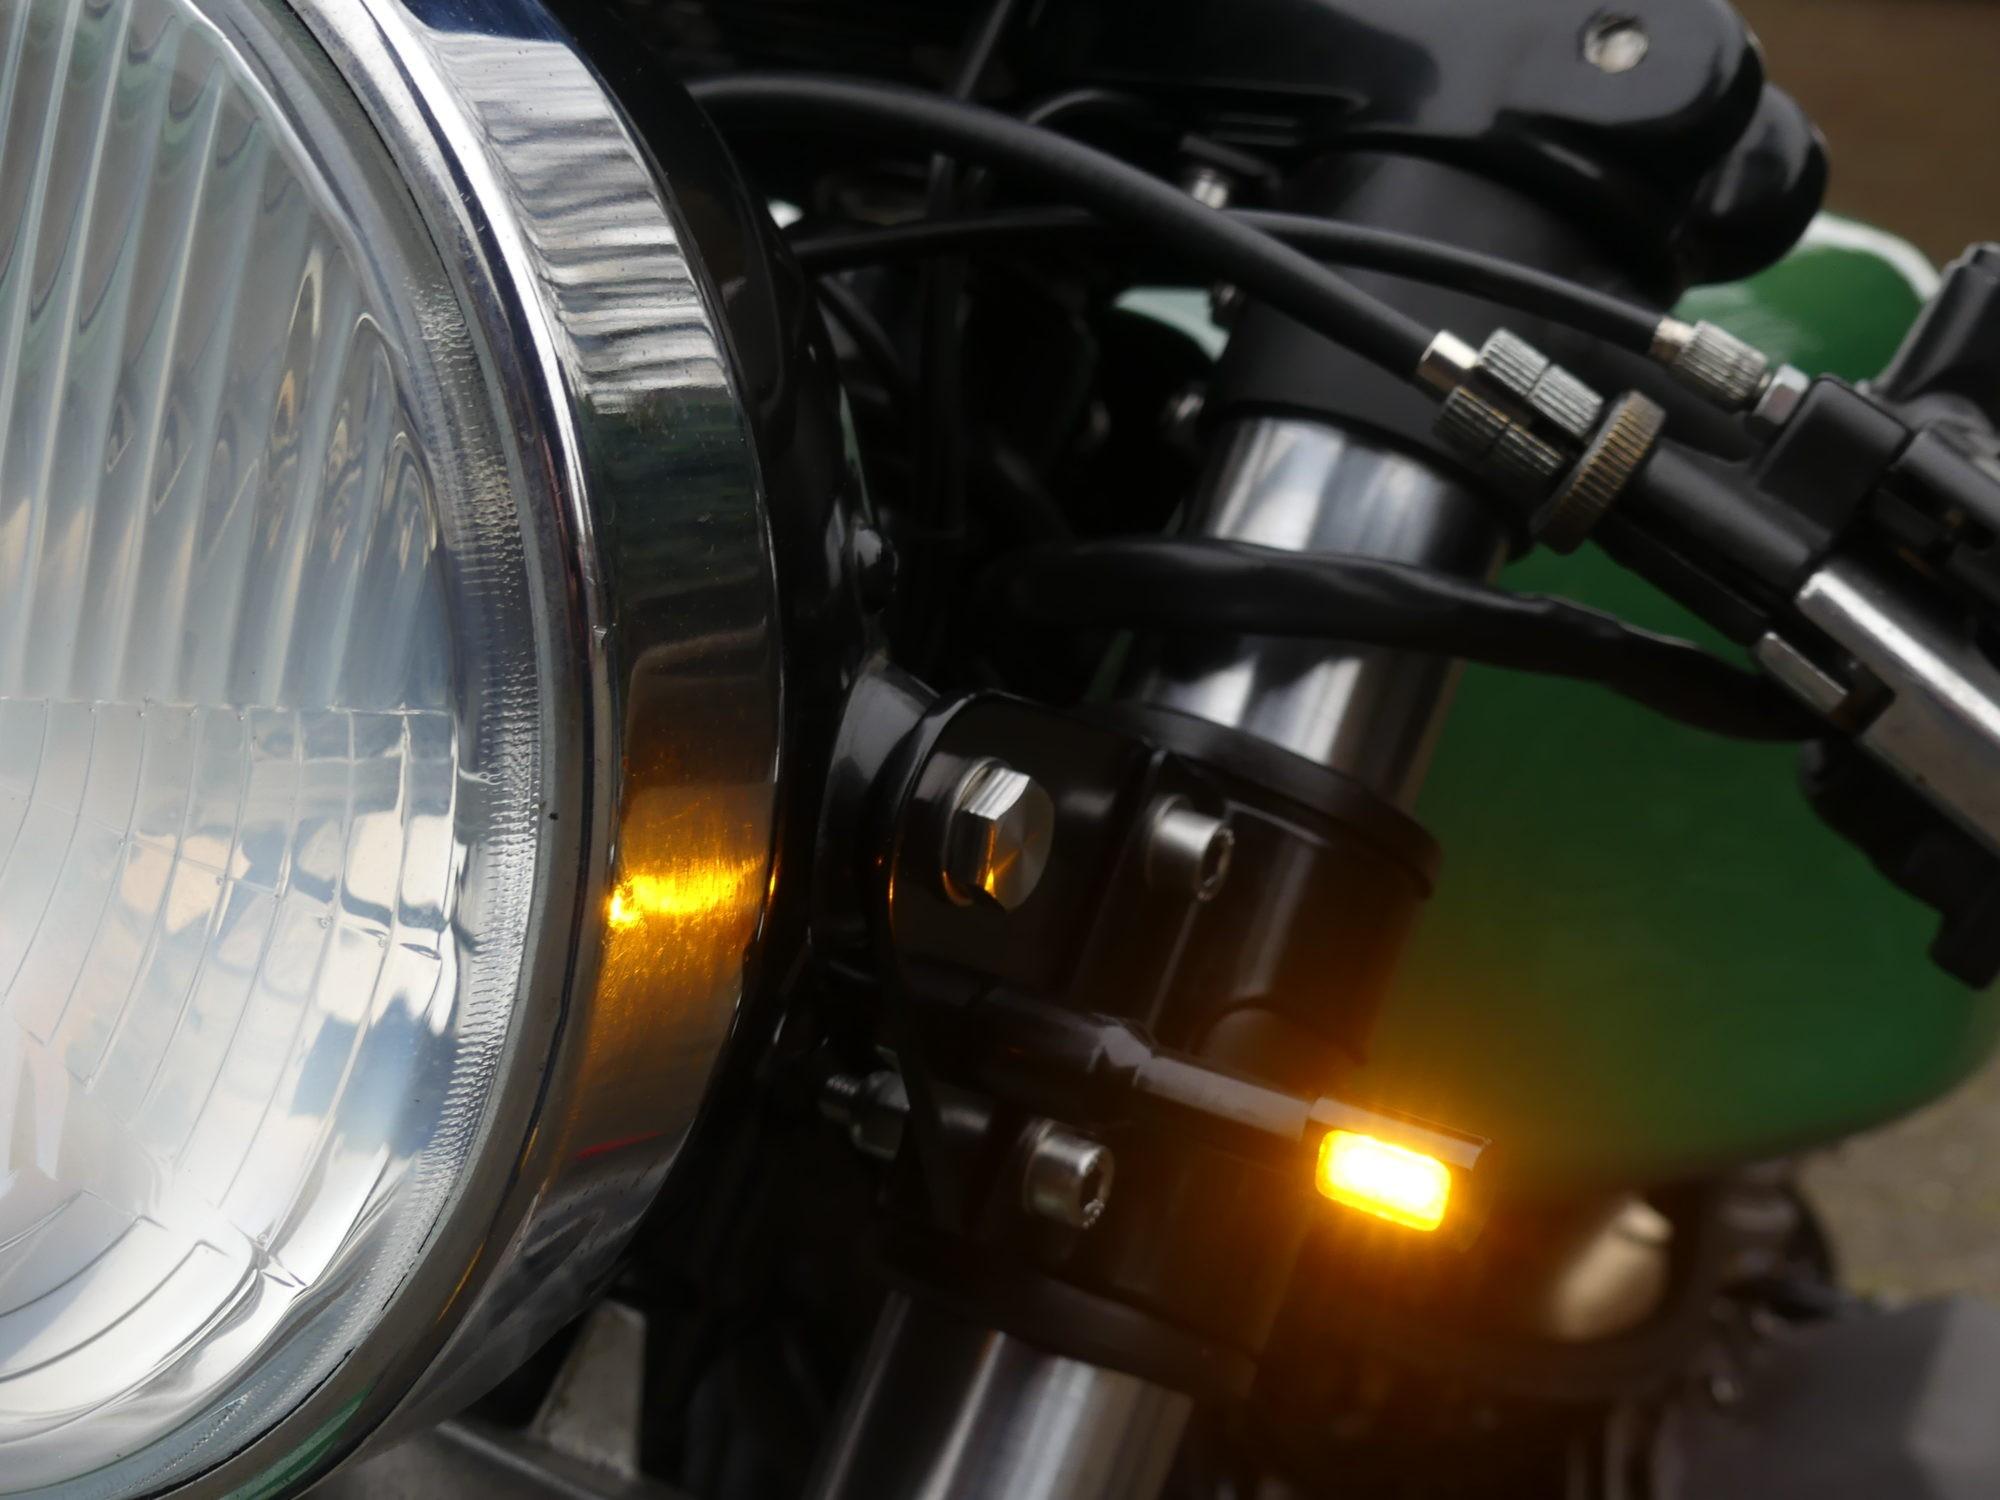 Moto Guzzi zelfbouw knipperlicht